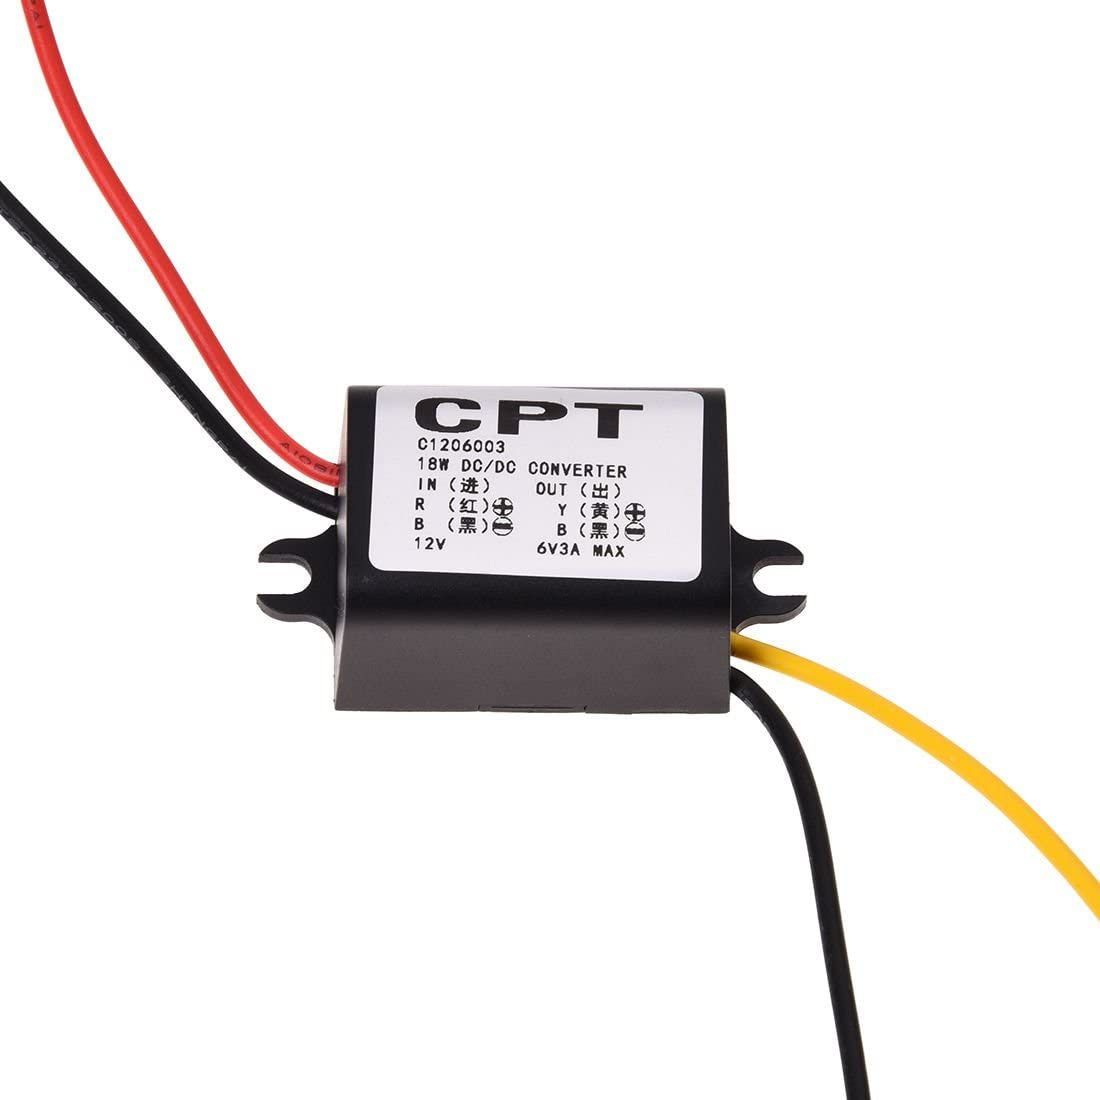 SODIAL R 12V to 6V DC-DC Buck Converter Step Down Module Power Supply Voltage Regulator